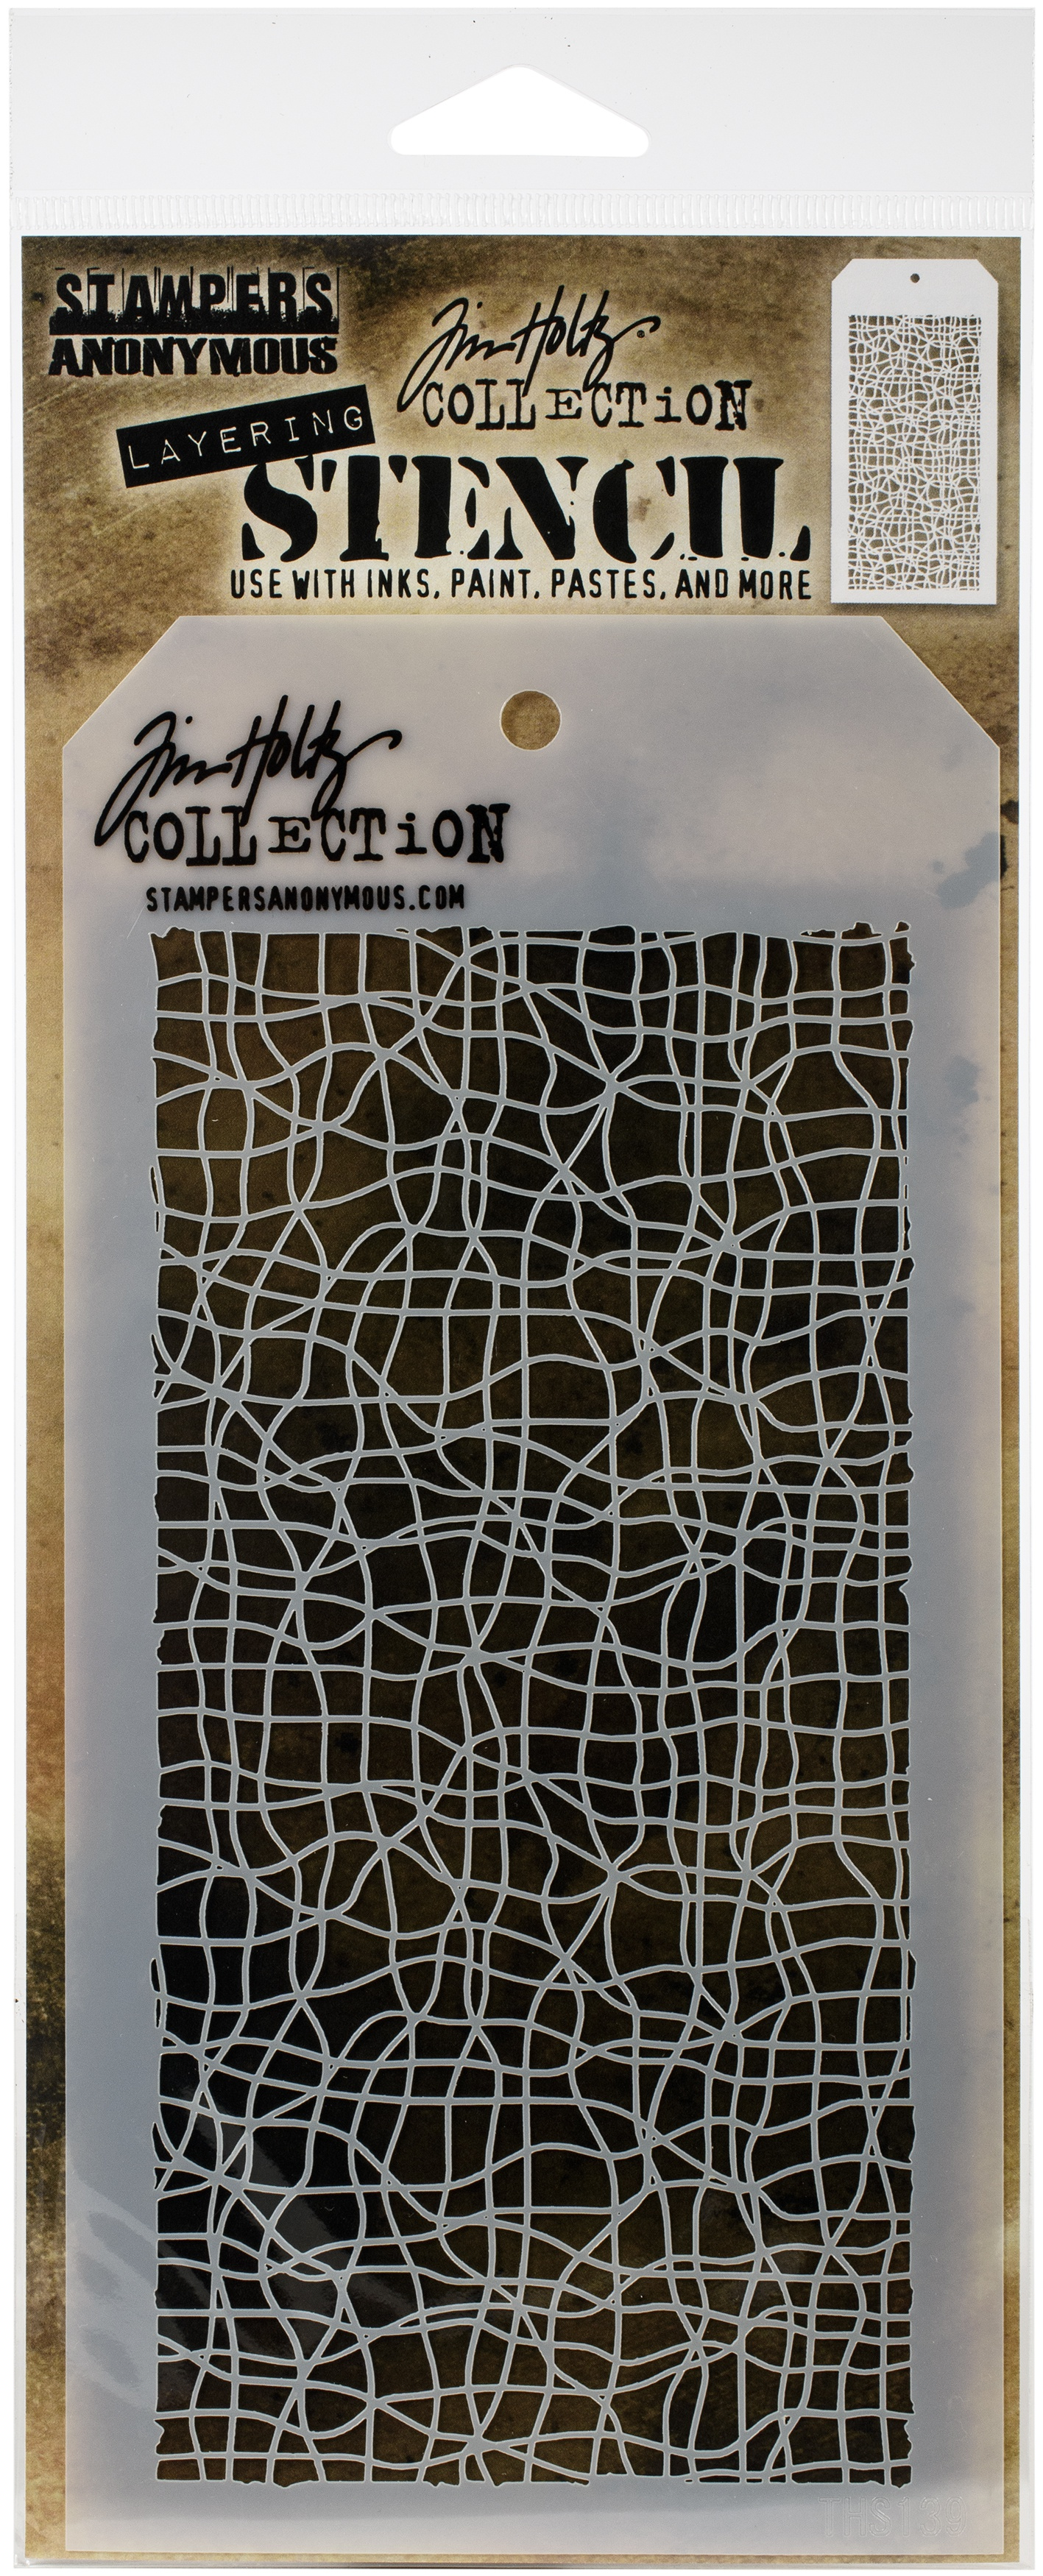 Tim Holtz Layered Stencil 4.125X8.5-Tangles -Layered